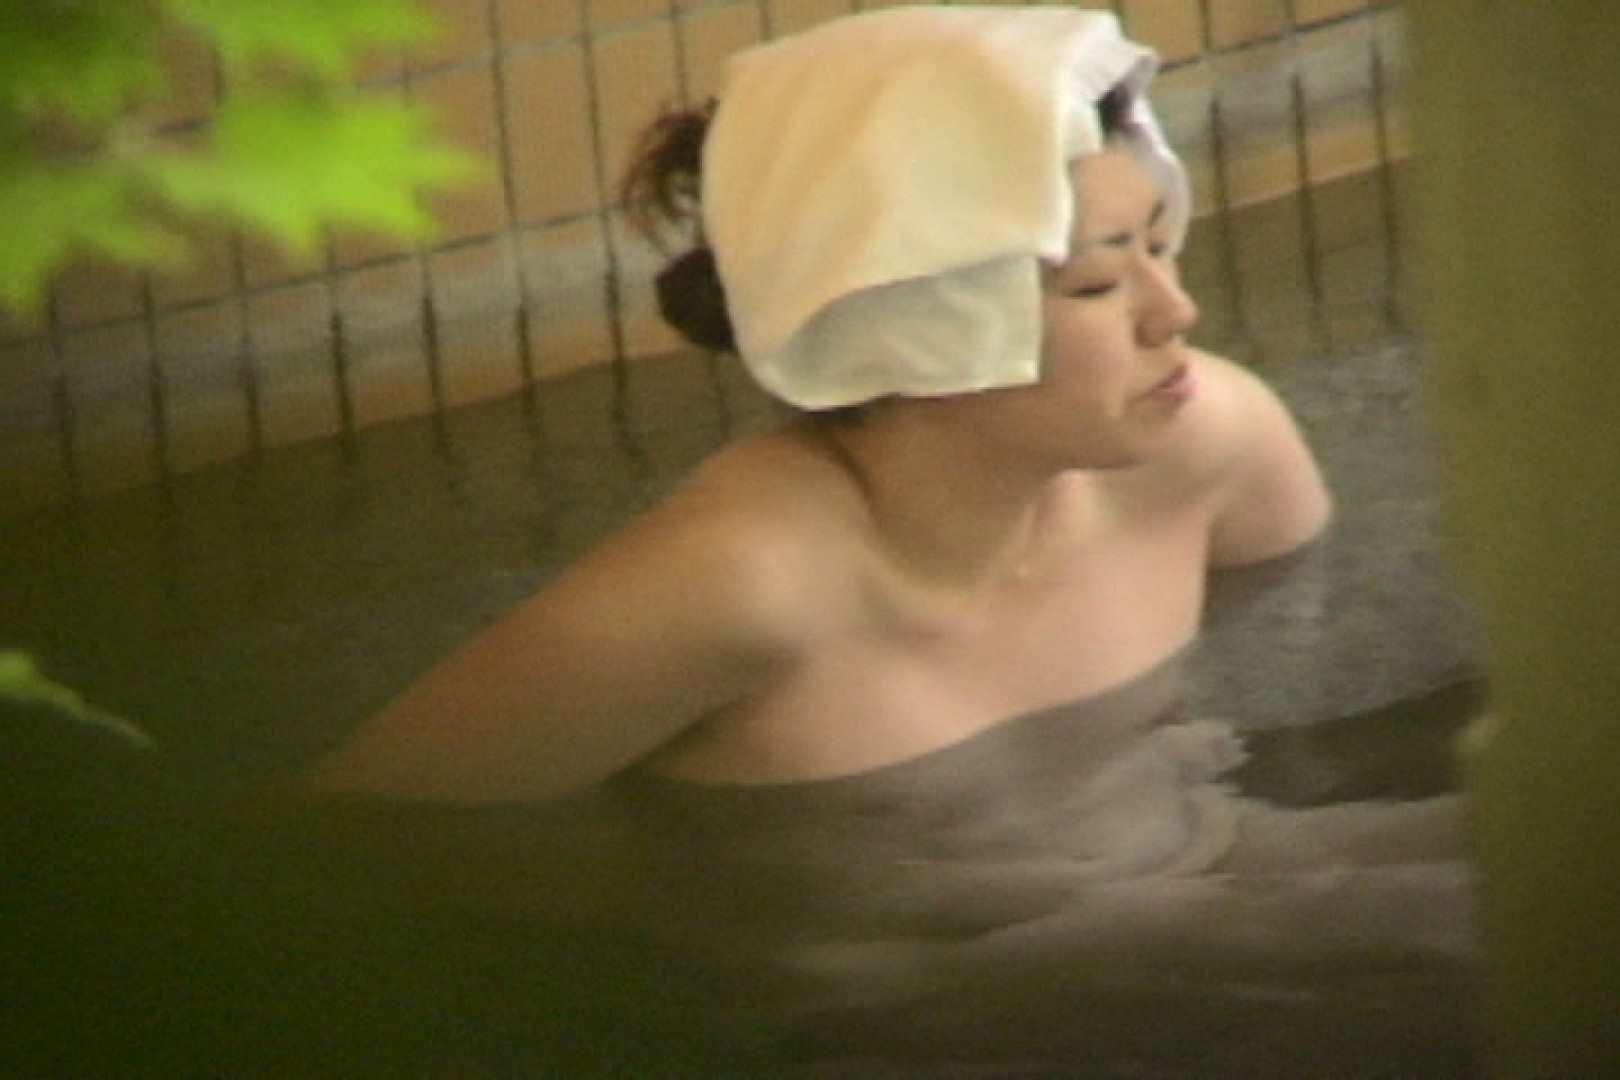 Aquaな露天風呂Vol.456 盗撮 | HなOL  102pic 48